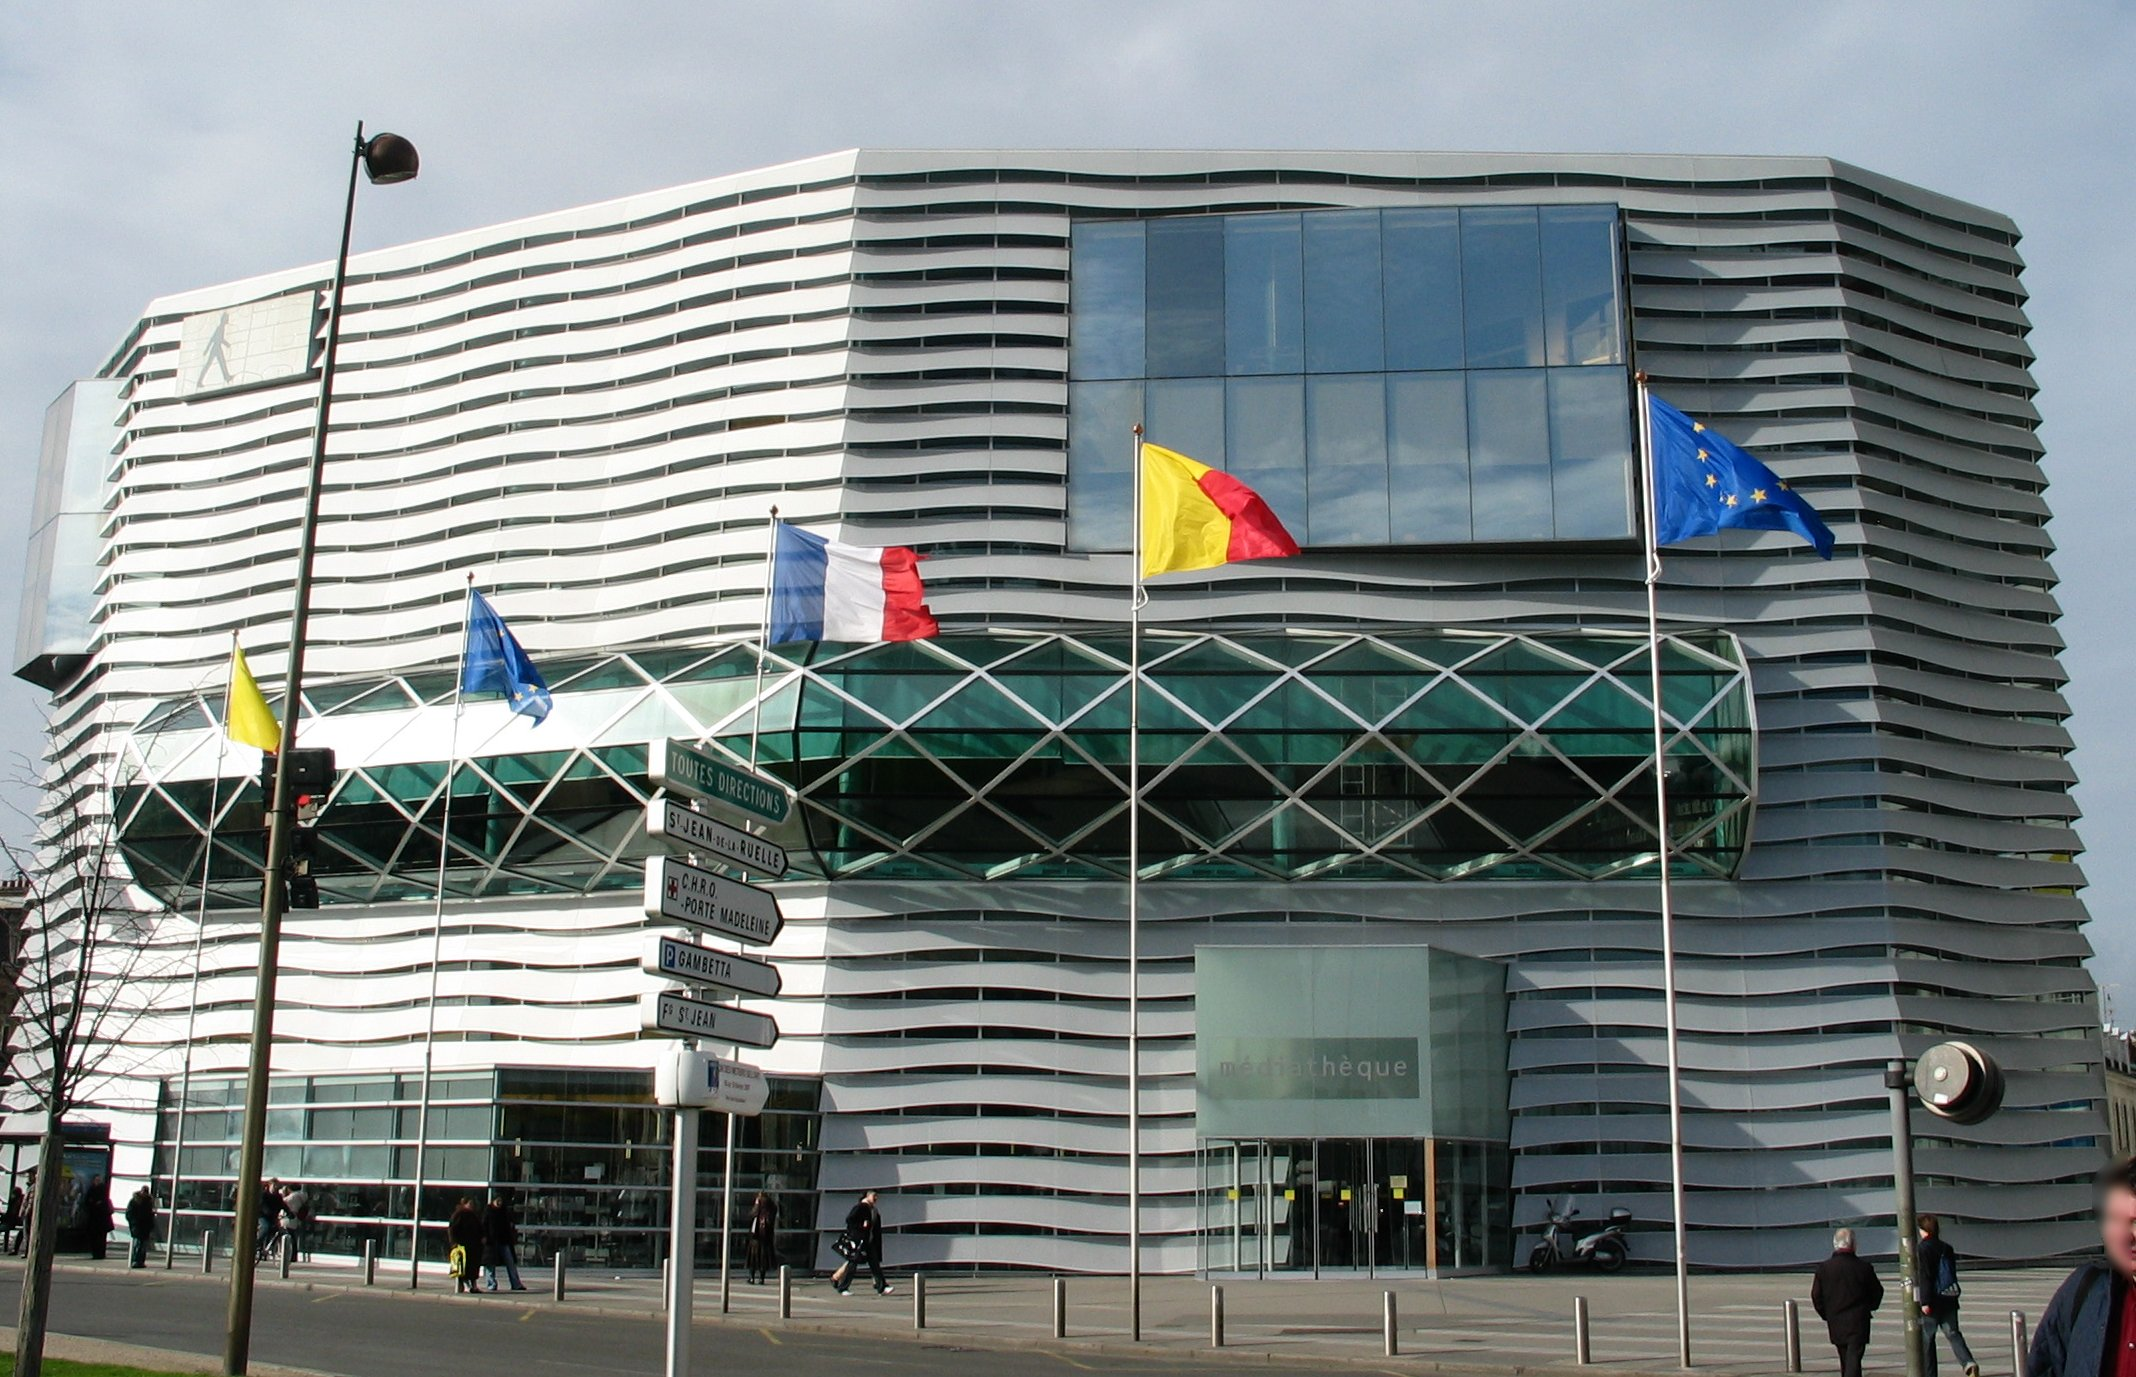 https://upload.wikimedia.org/wikipedia/commons/9/9c/Mediatheque_orleans_france.jpg